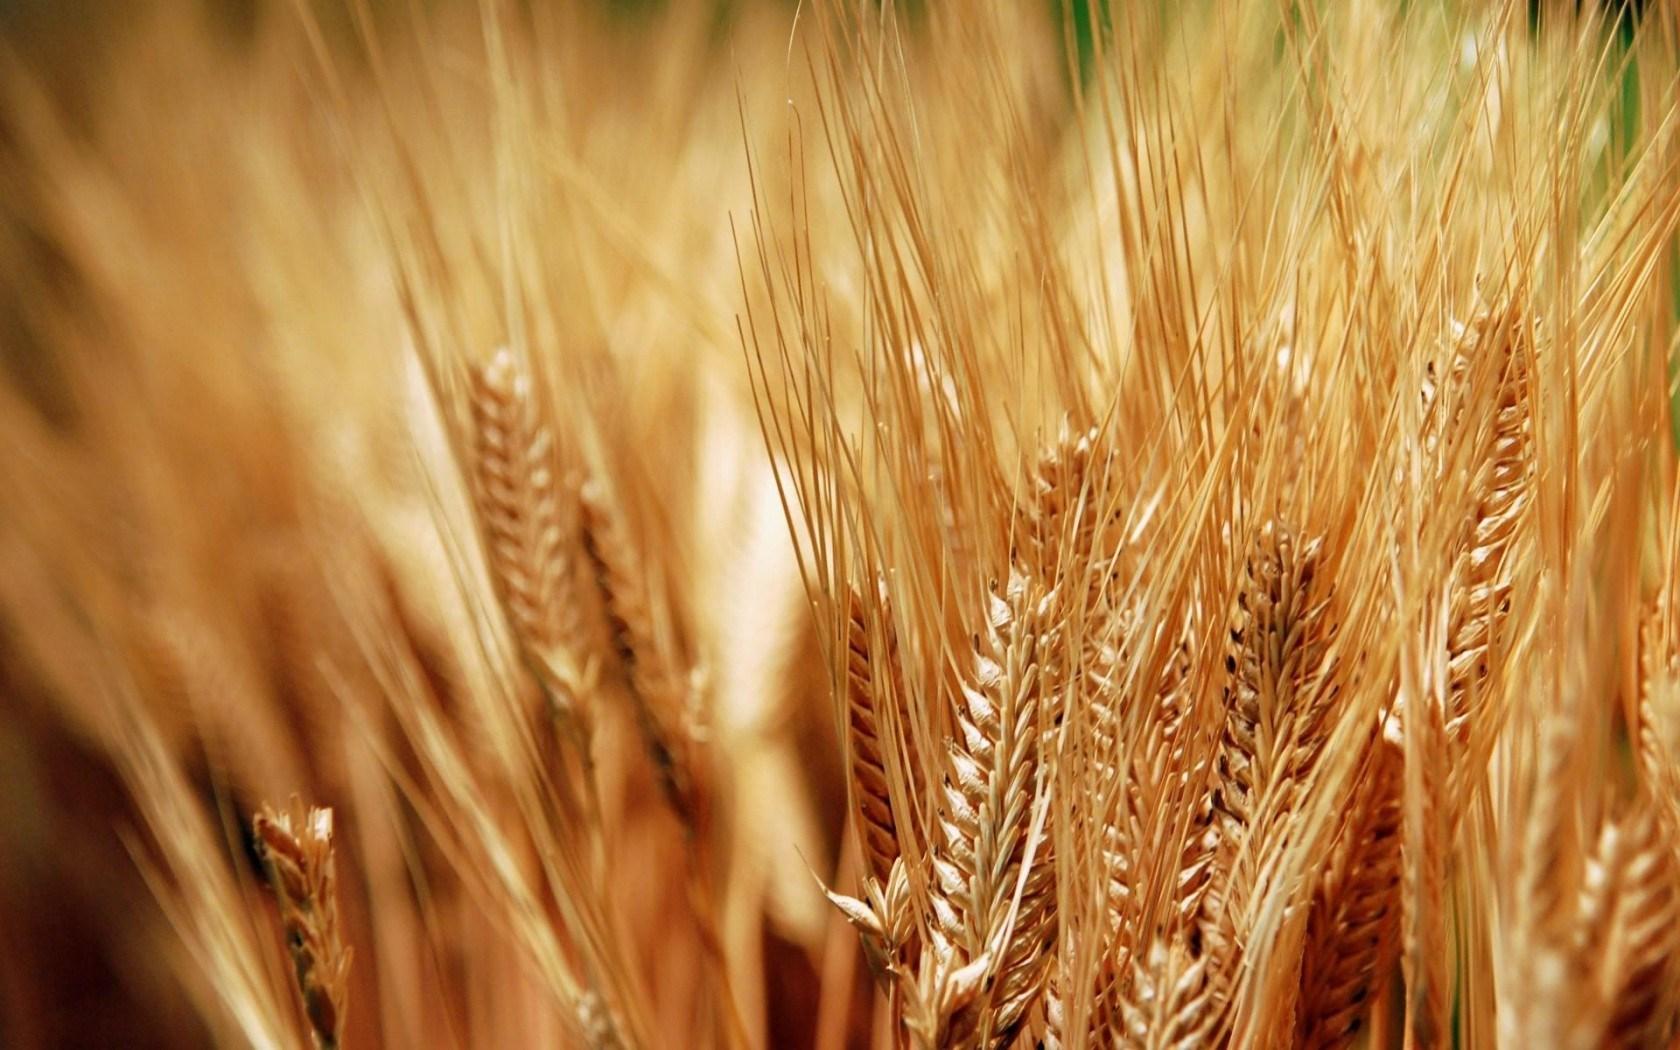 Nature Wheat Plants Close-Up